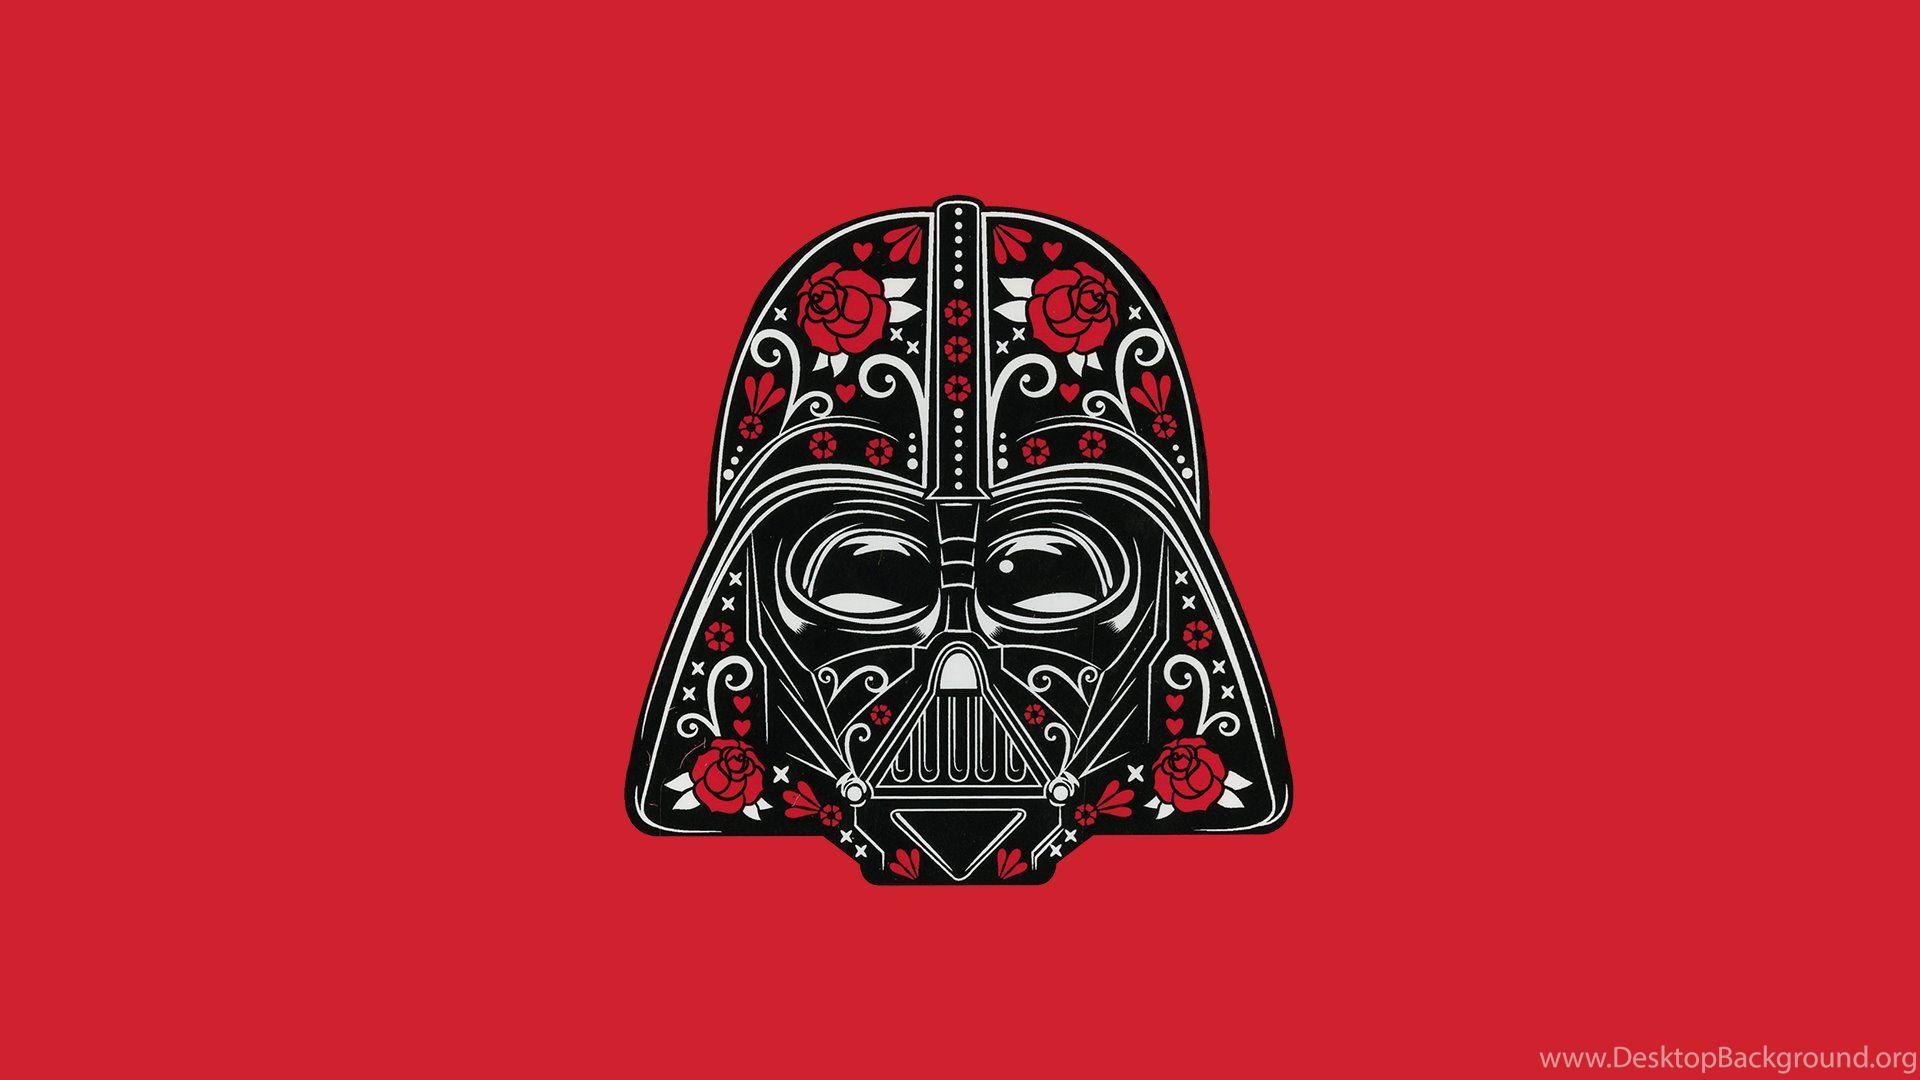 Star Wars Minimalist High Definition